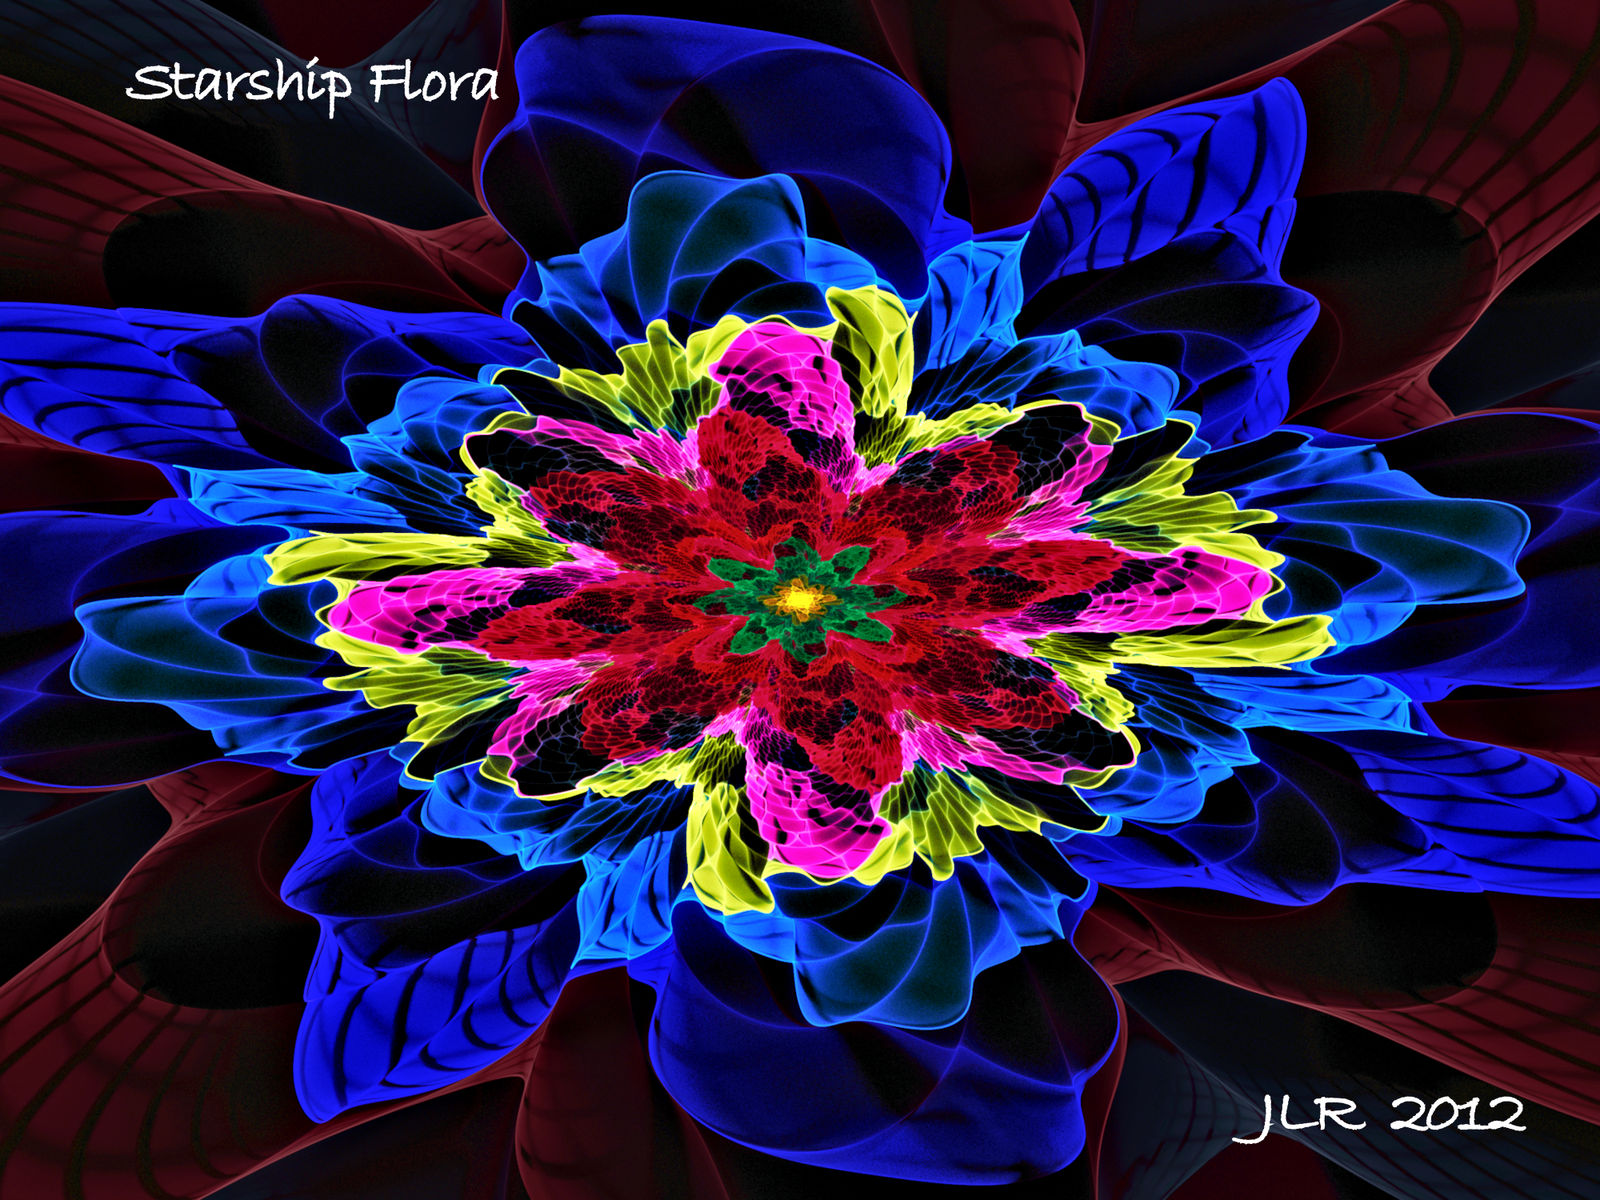 STARSHIP FLORA